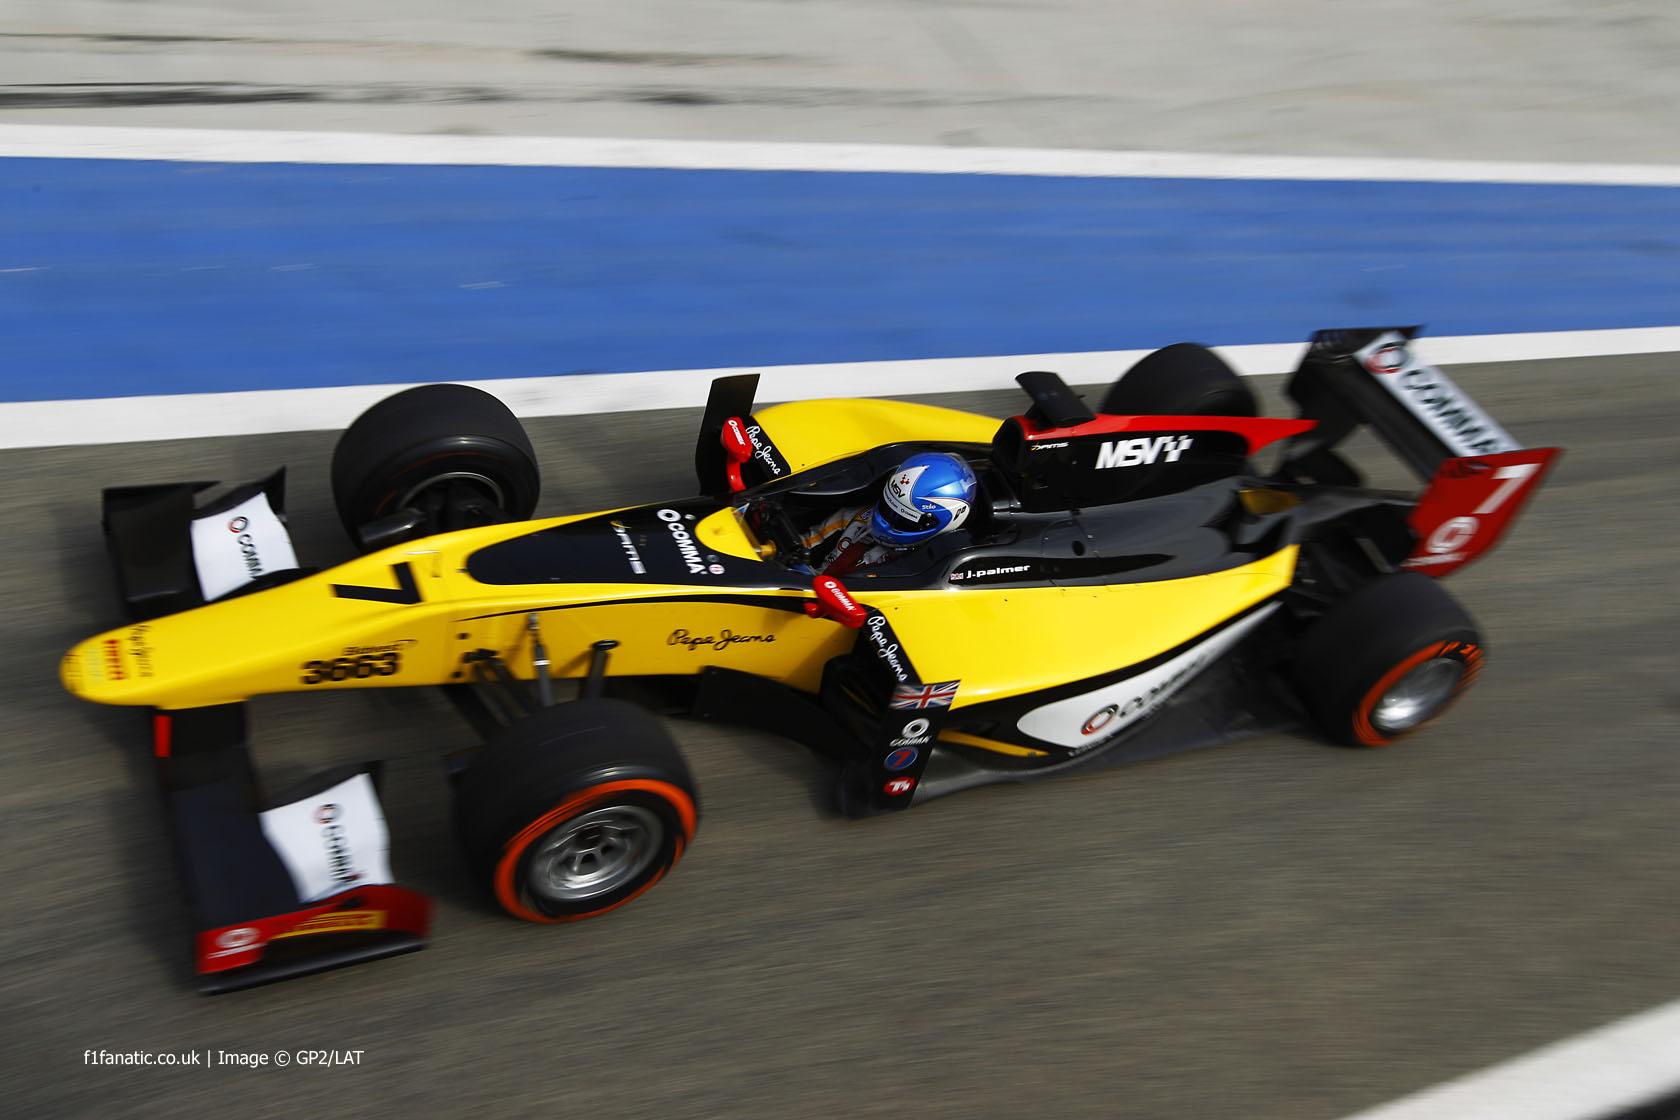 Jolyon Palmer, DAMS, GP2, Bahrain, 2014